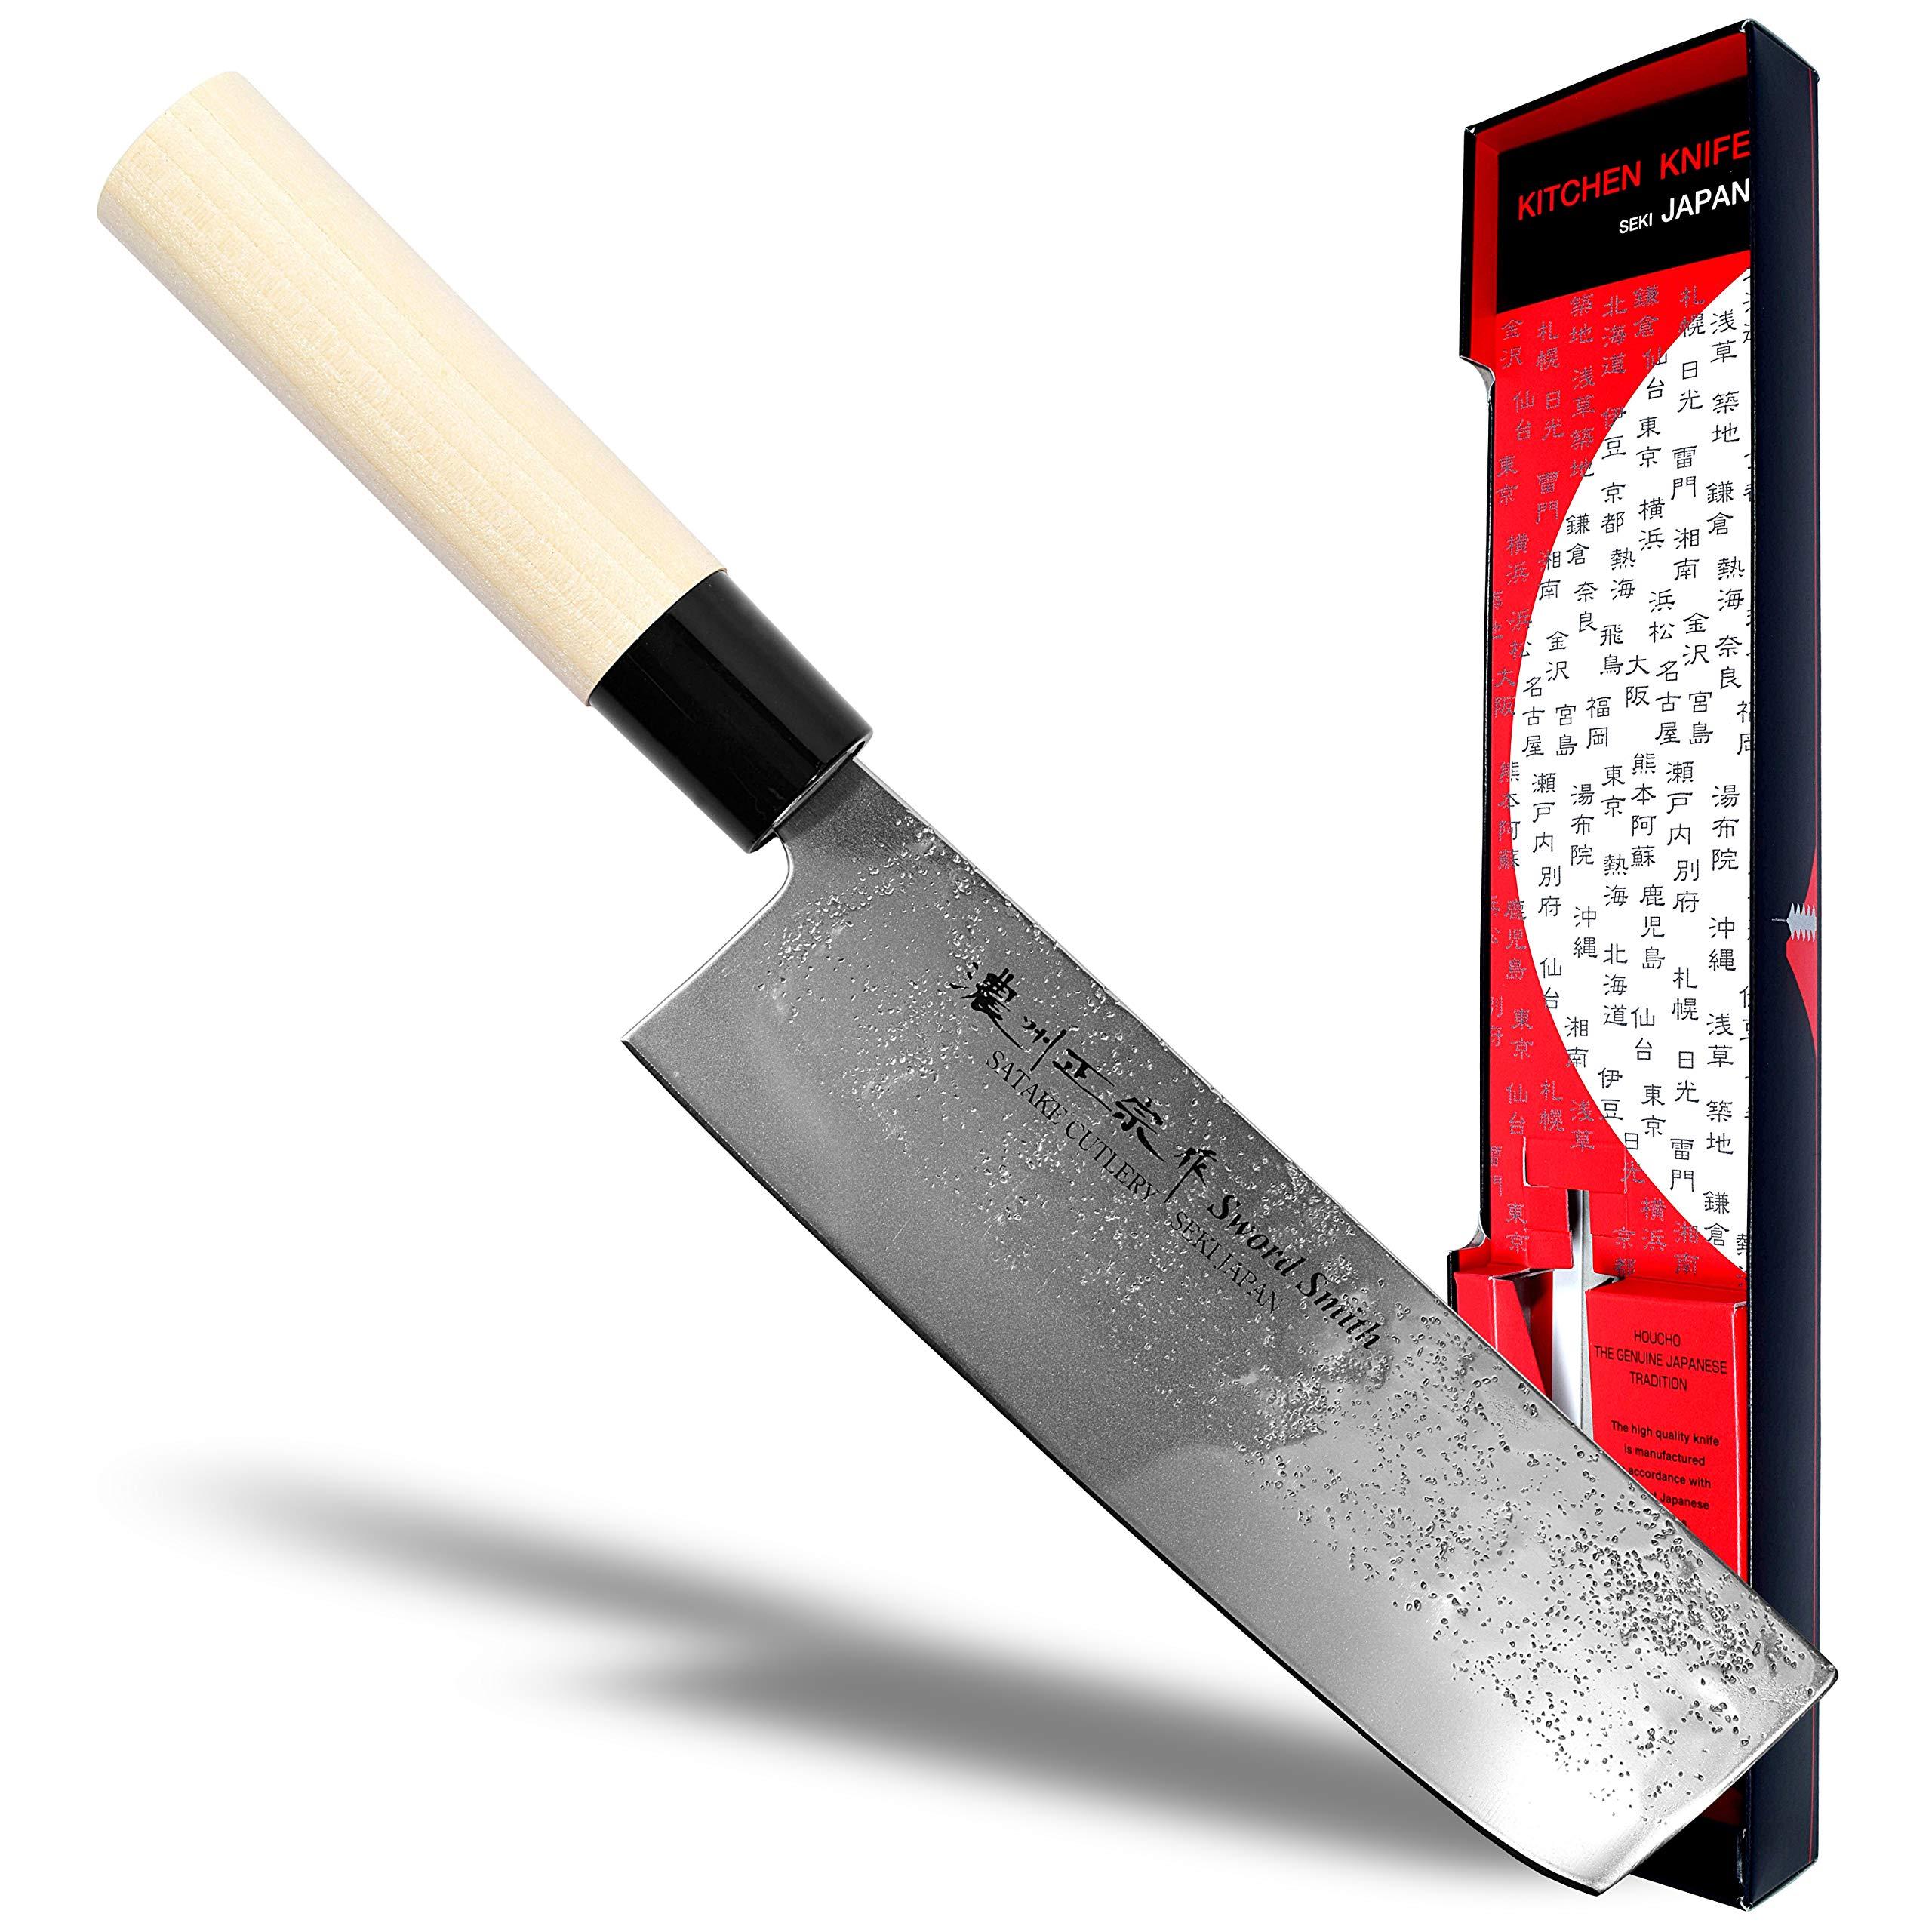 Seki Japan MASAMUNE, Japanese Vegetable Kitchen Knife, Nashiji Stain Finish Stainless Steel Nakiri Knife, Shiraki Handle, 6.3 inch (160mm) by product of gifu japan